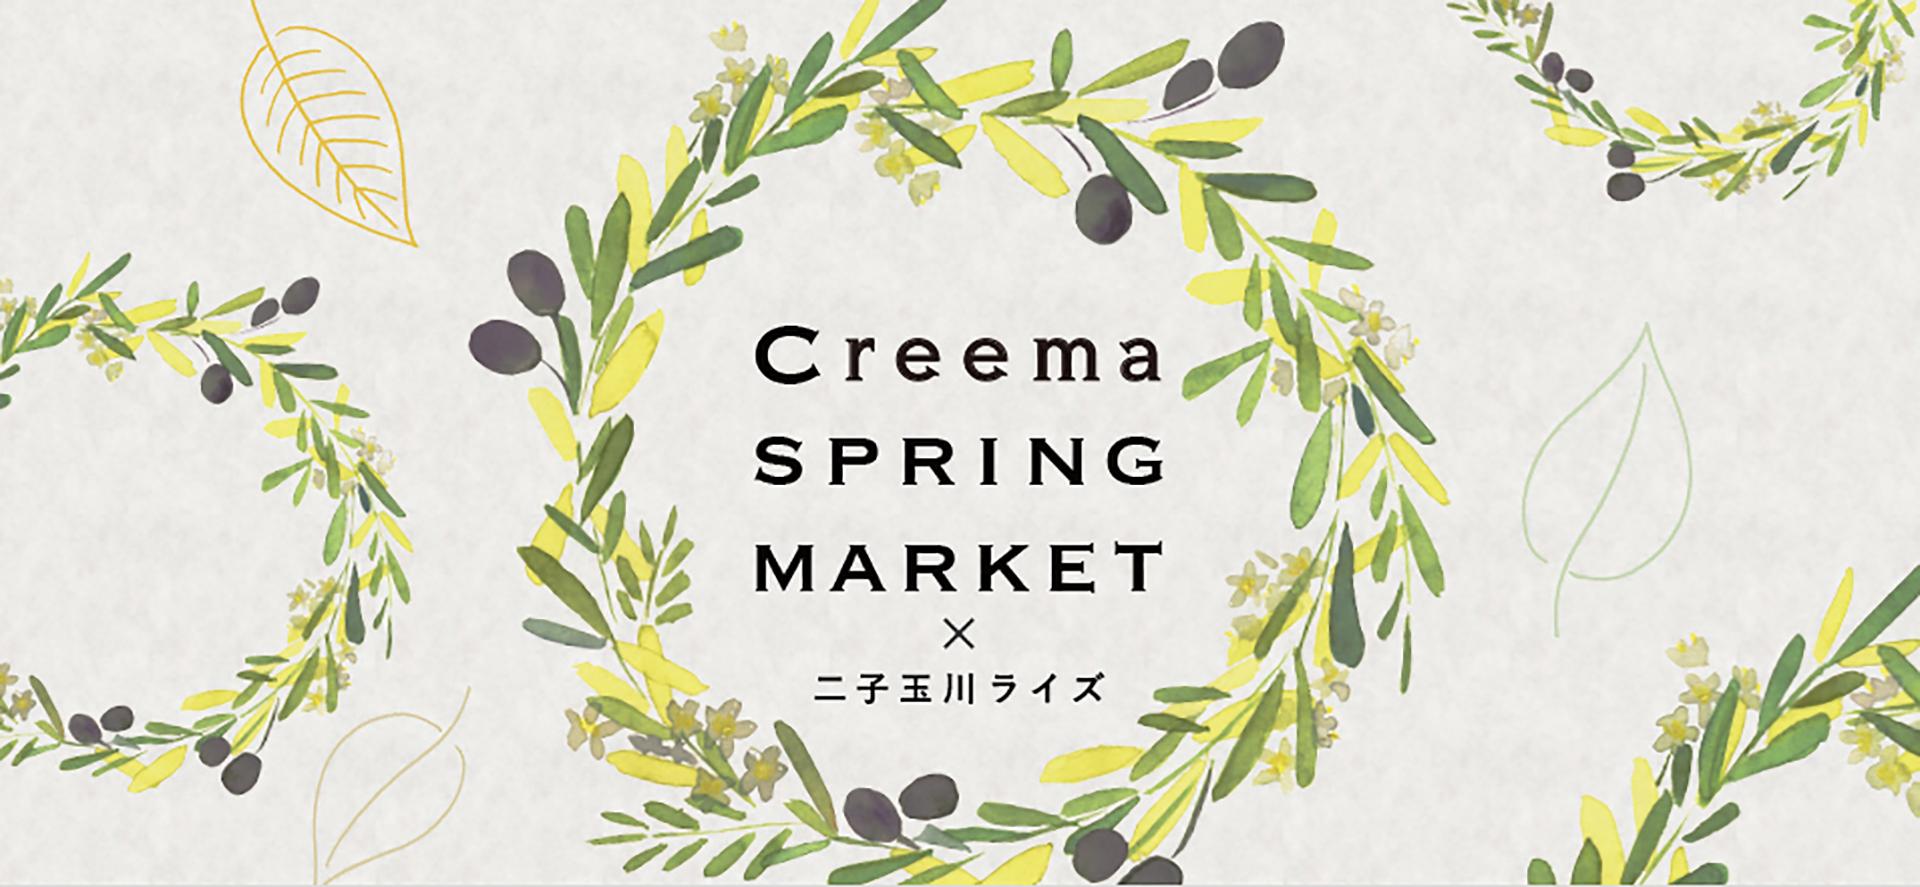 Creema SPRING MARKET×二子玉川ライズ